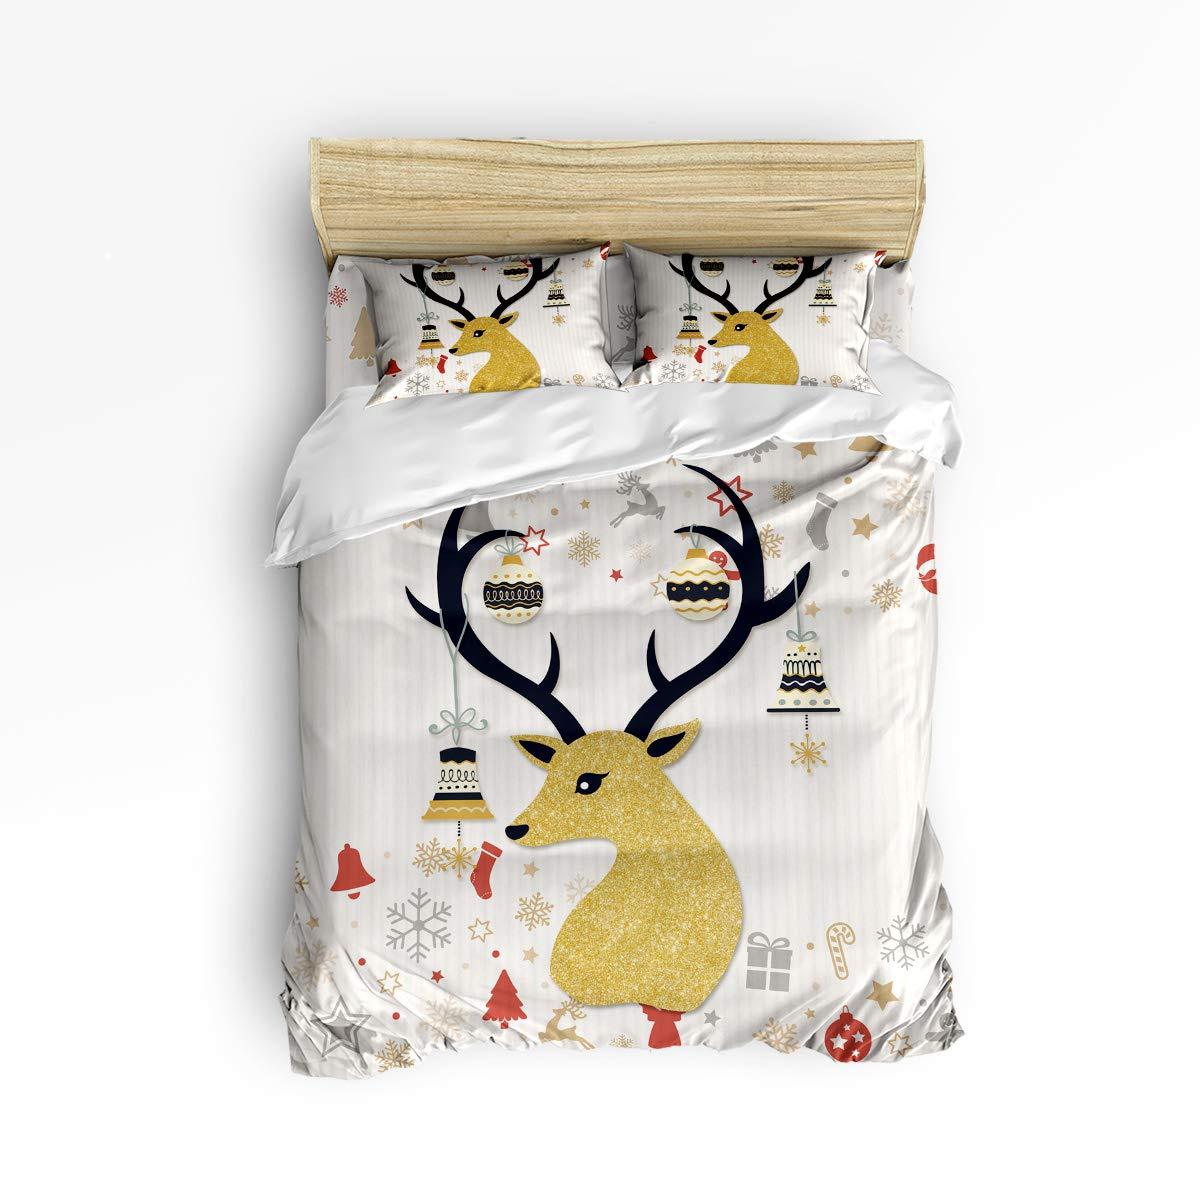 Merry Christmas テーマ 掛け布団カバー寝具4点セット 枕カバー2枚 ウルトラソフト 低刺激性マイクロファイバー (掛け布団なし) ツイン 20181116LTTTMSJTBCSSWTQ00582SJTATMY B07KP4BPN3 Reindeer20tmy6262 ツイン